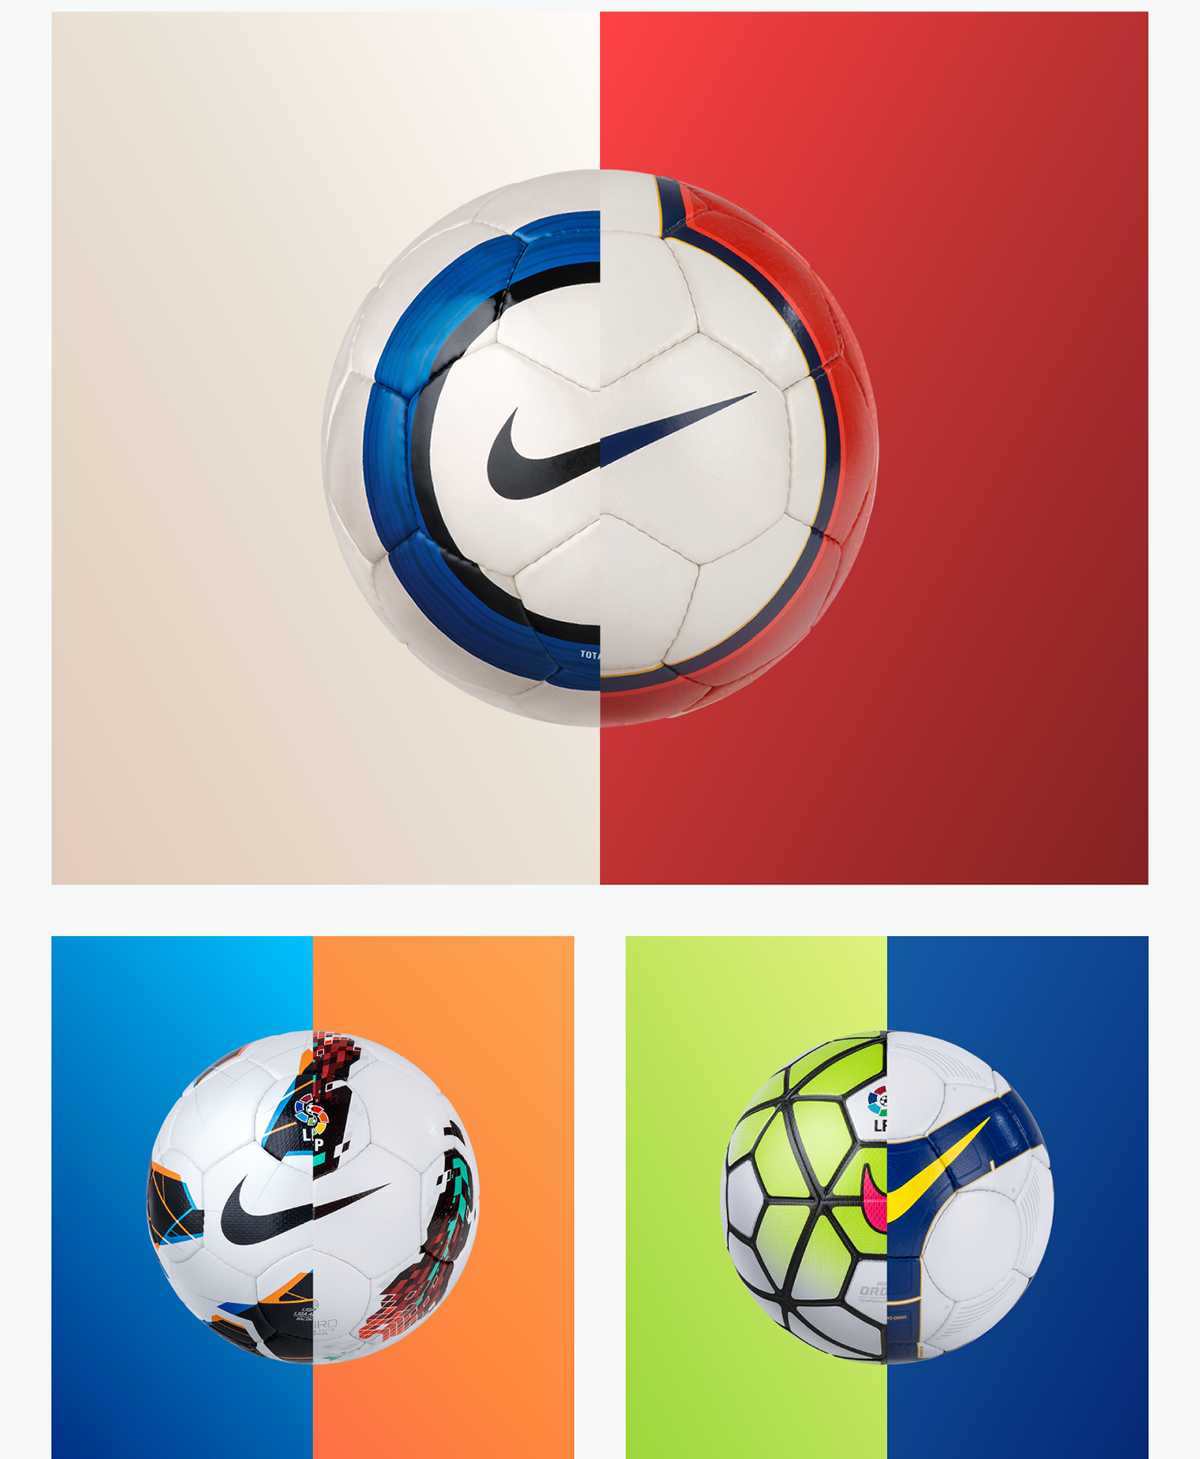 dd7c242d6d0 Nike - LaLiga Ball Hub - Website on Wacom Gallery